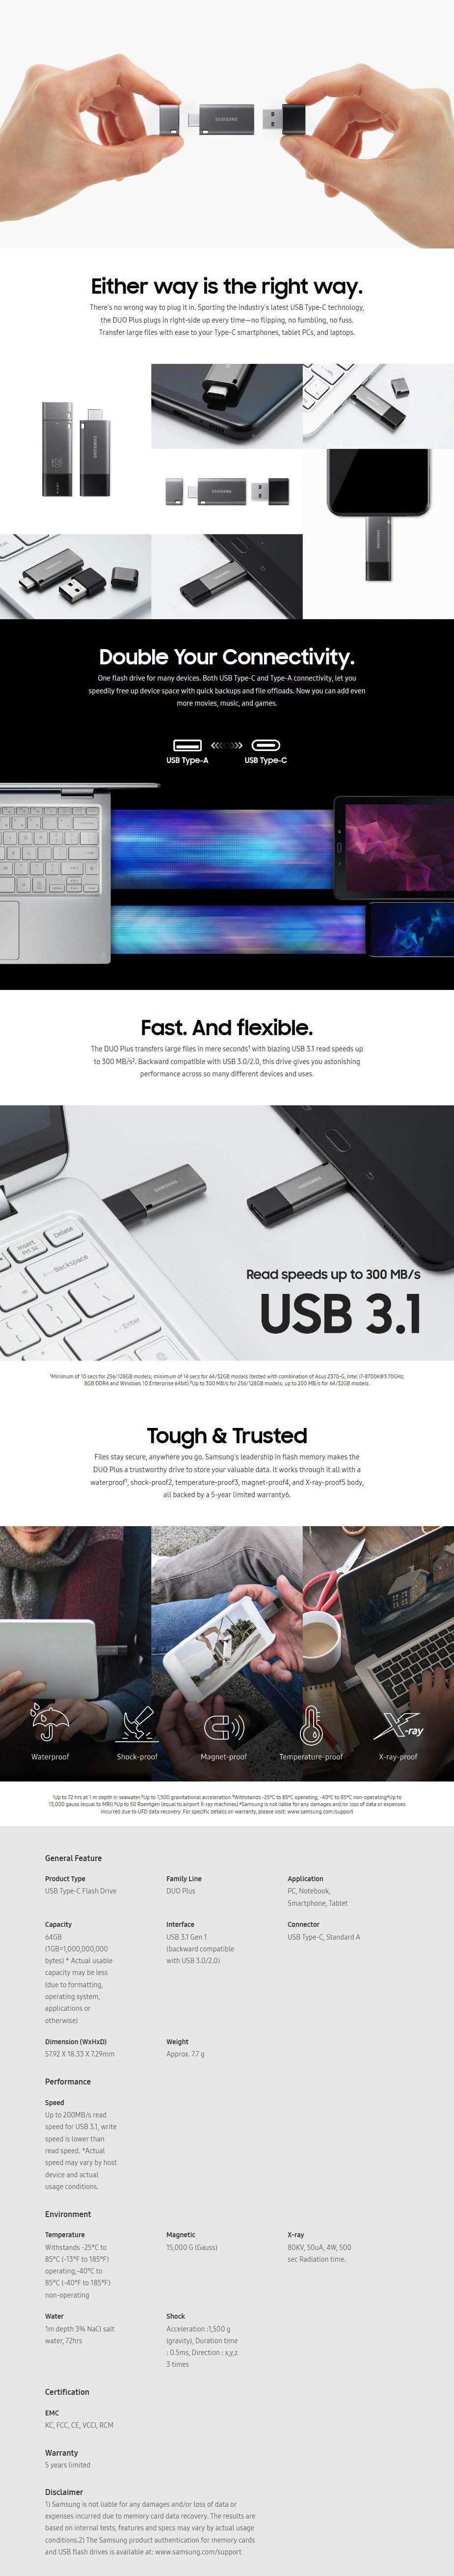 Samsung MUF-64DB/APC 64GB DUO Plus USB-C Flash Drive - Overview 1